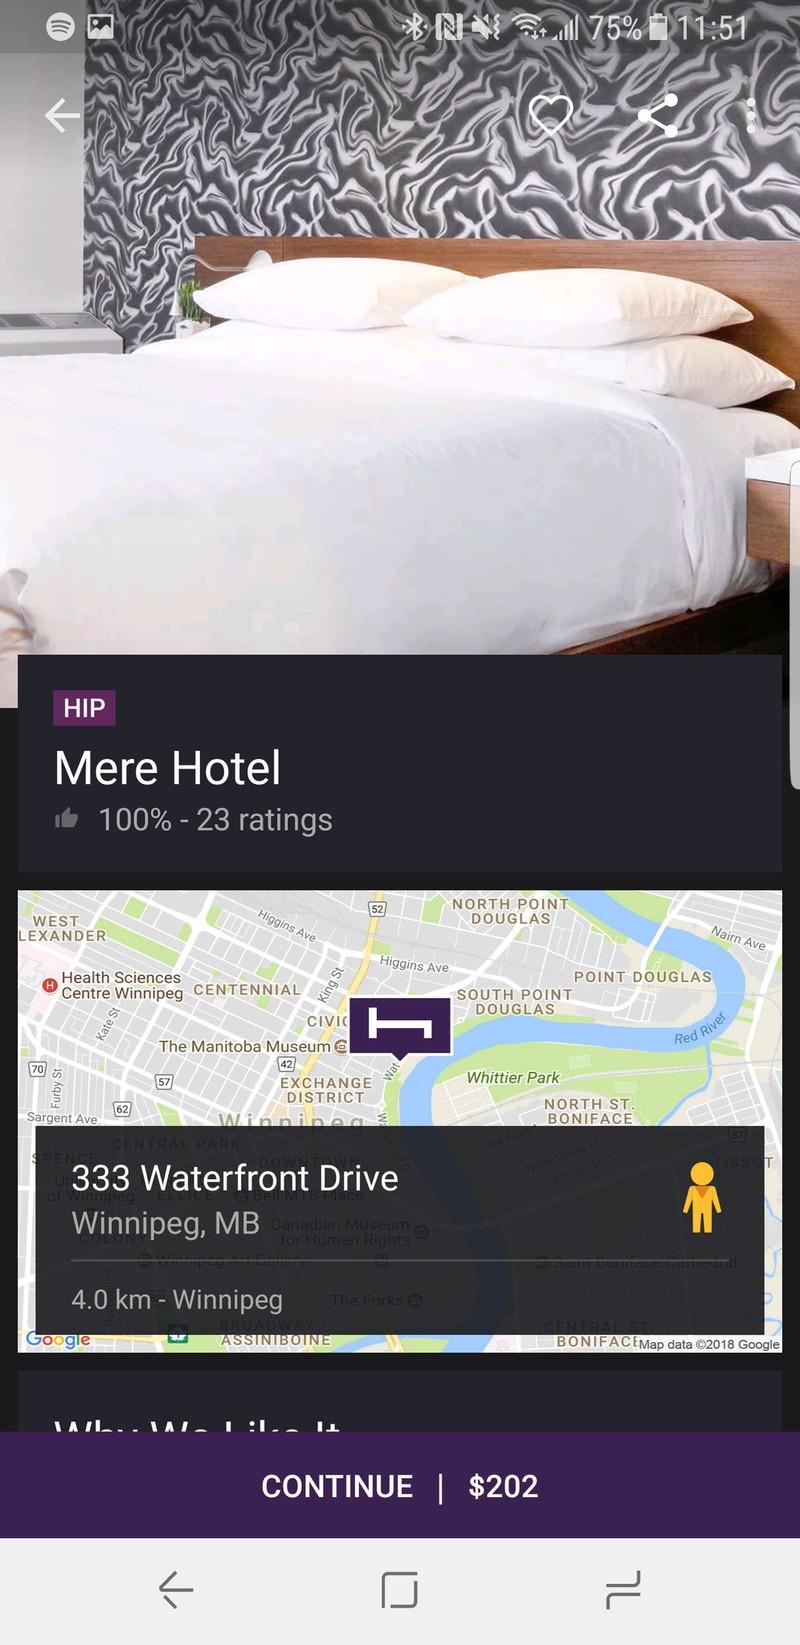 hoteltonight-screens-02.jpg?itok=WQkd2CS